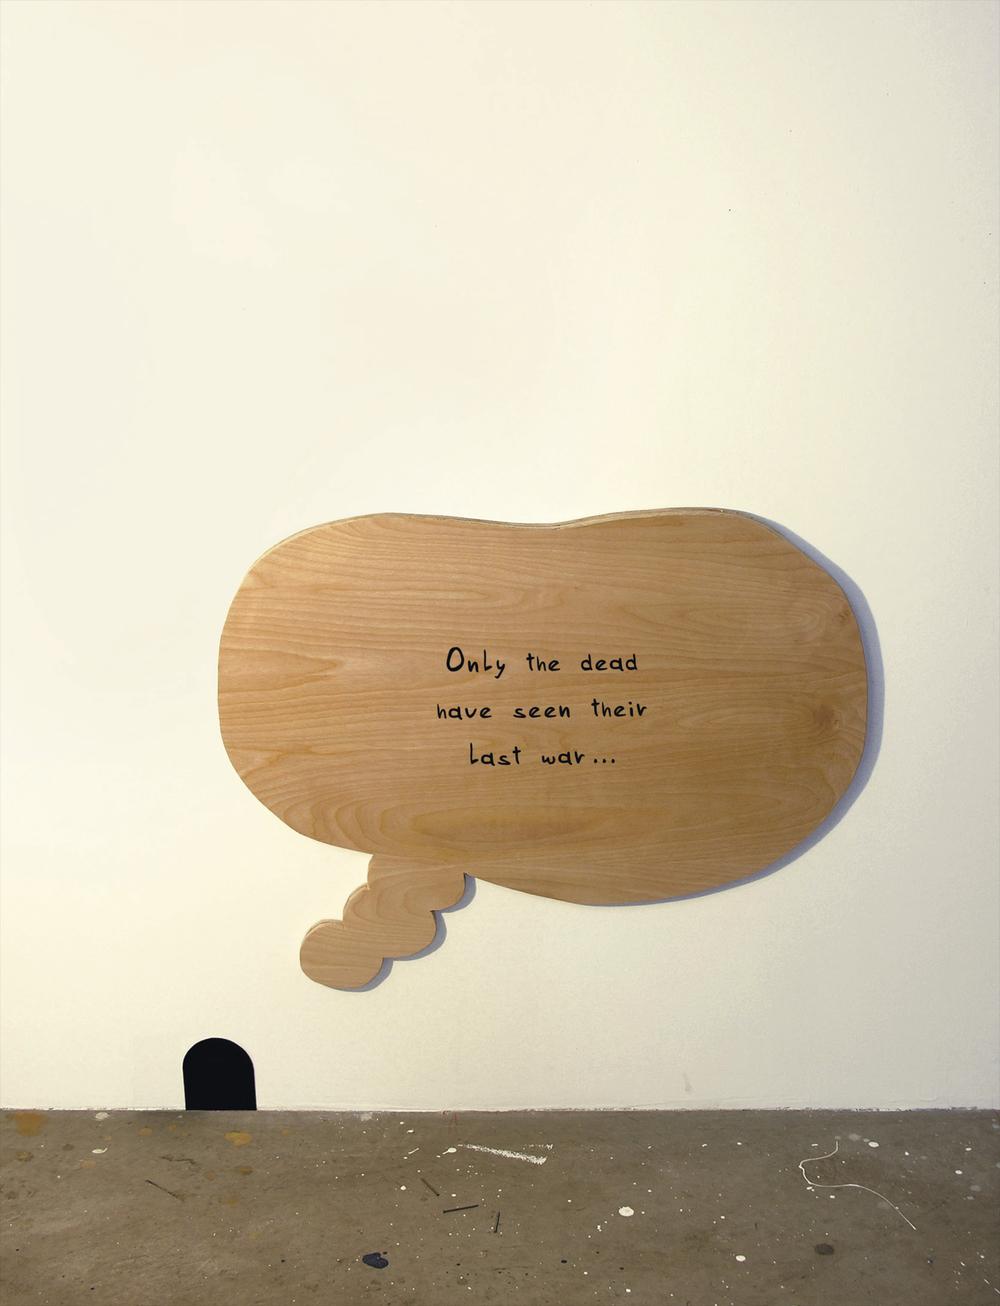 Plato's Mouse Hole, 2008